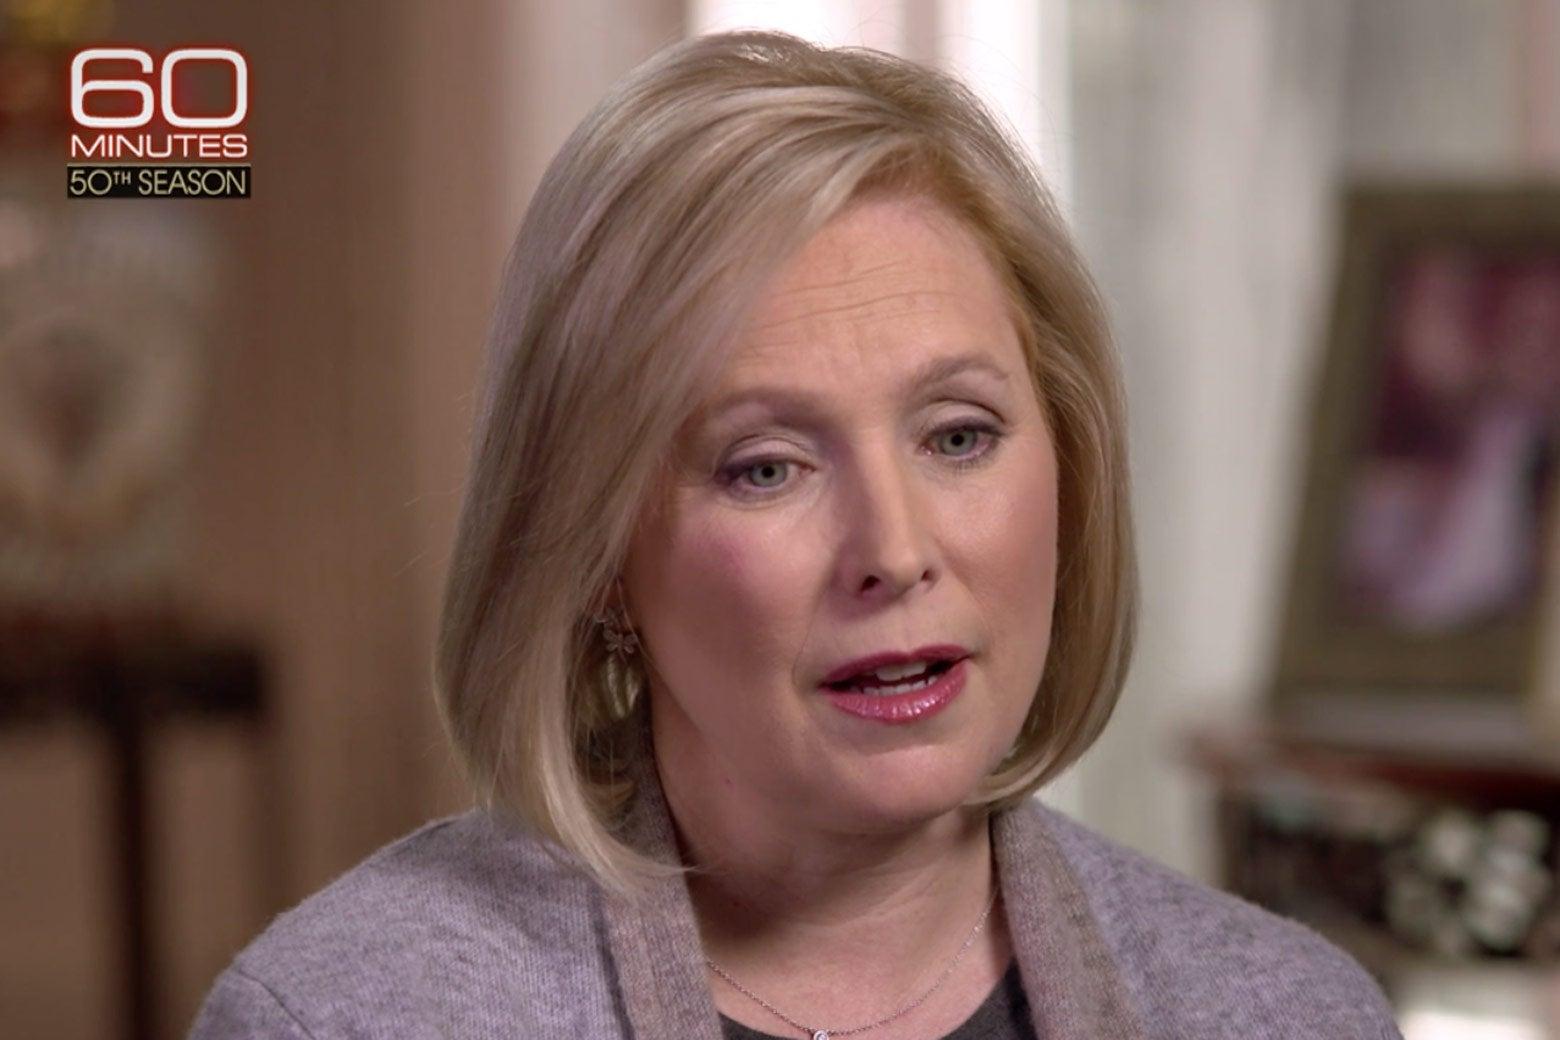 A screenshot close-up of Kirsten Gillibrand on 60 Minutes.